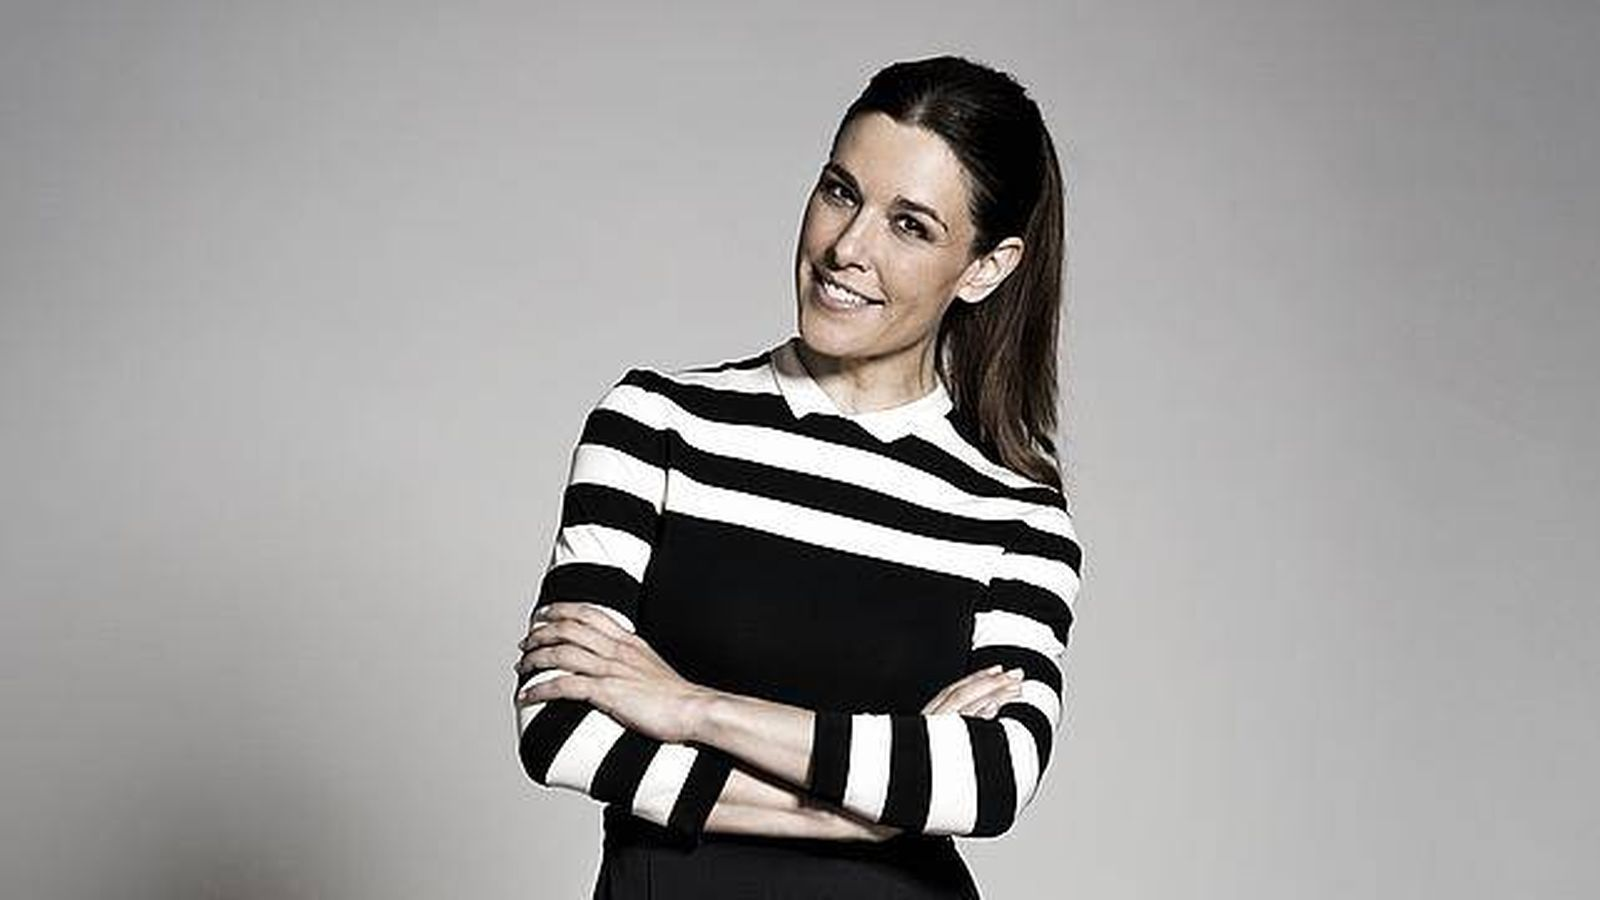 Foto: Raquel Sánchez Silva, presentadora de 'Likes'.